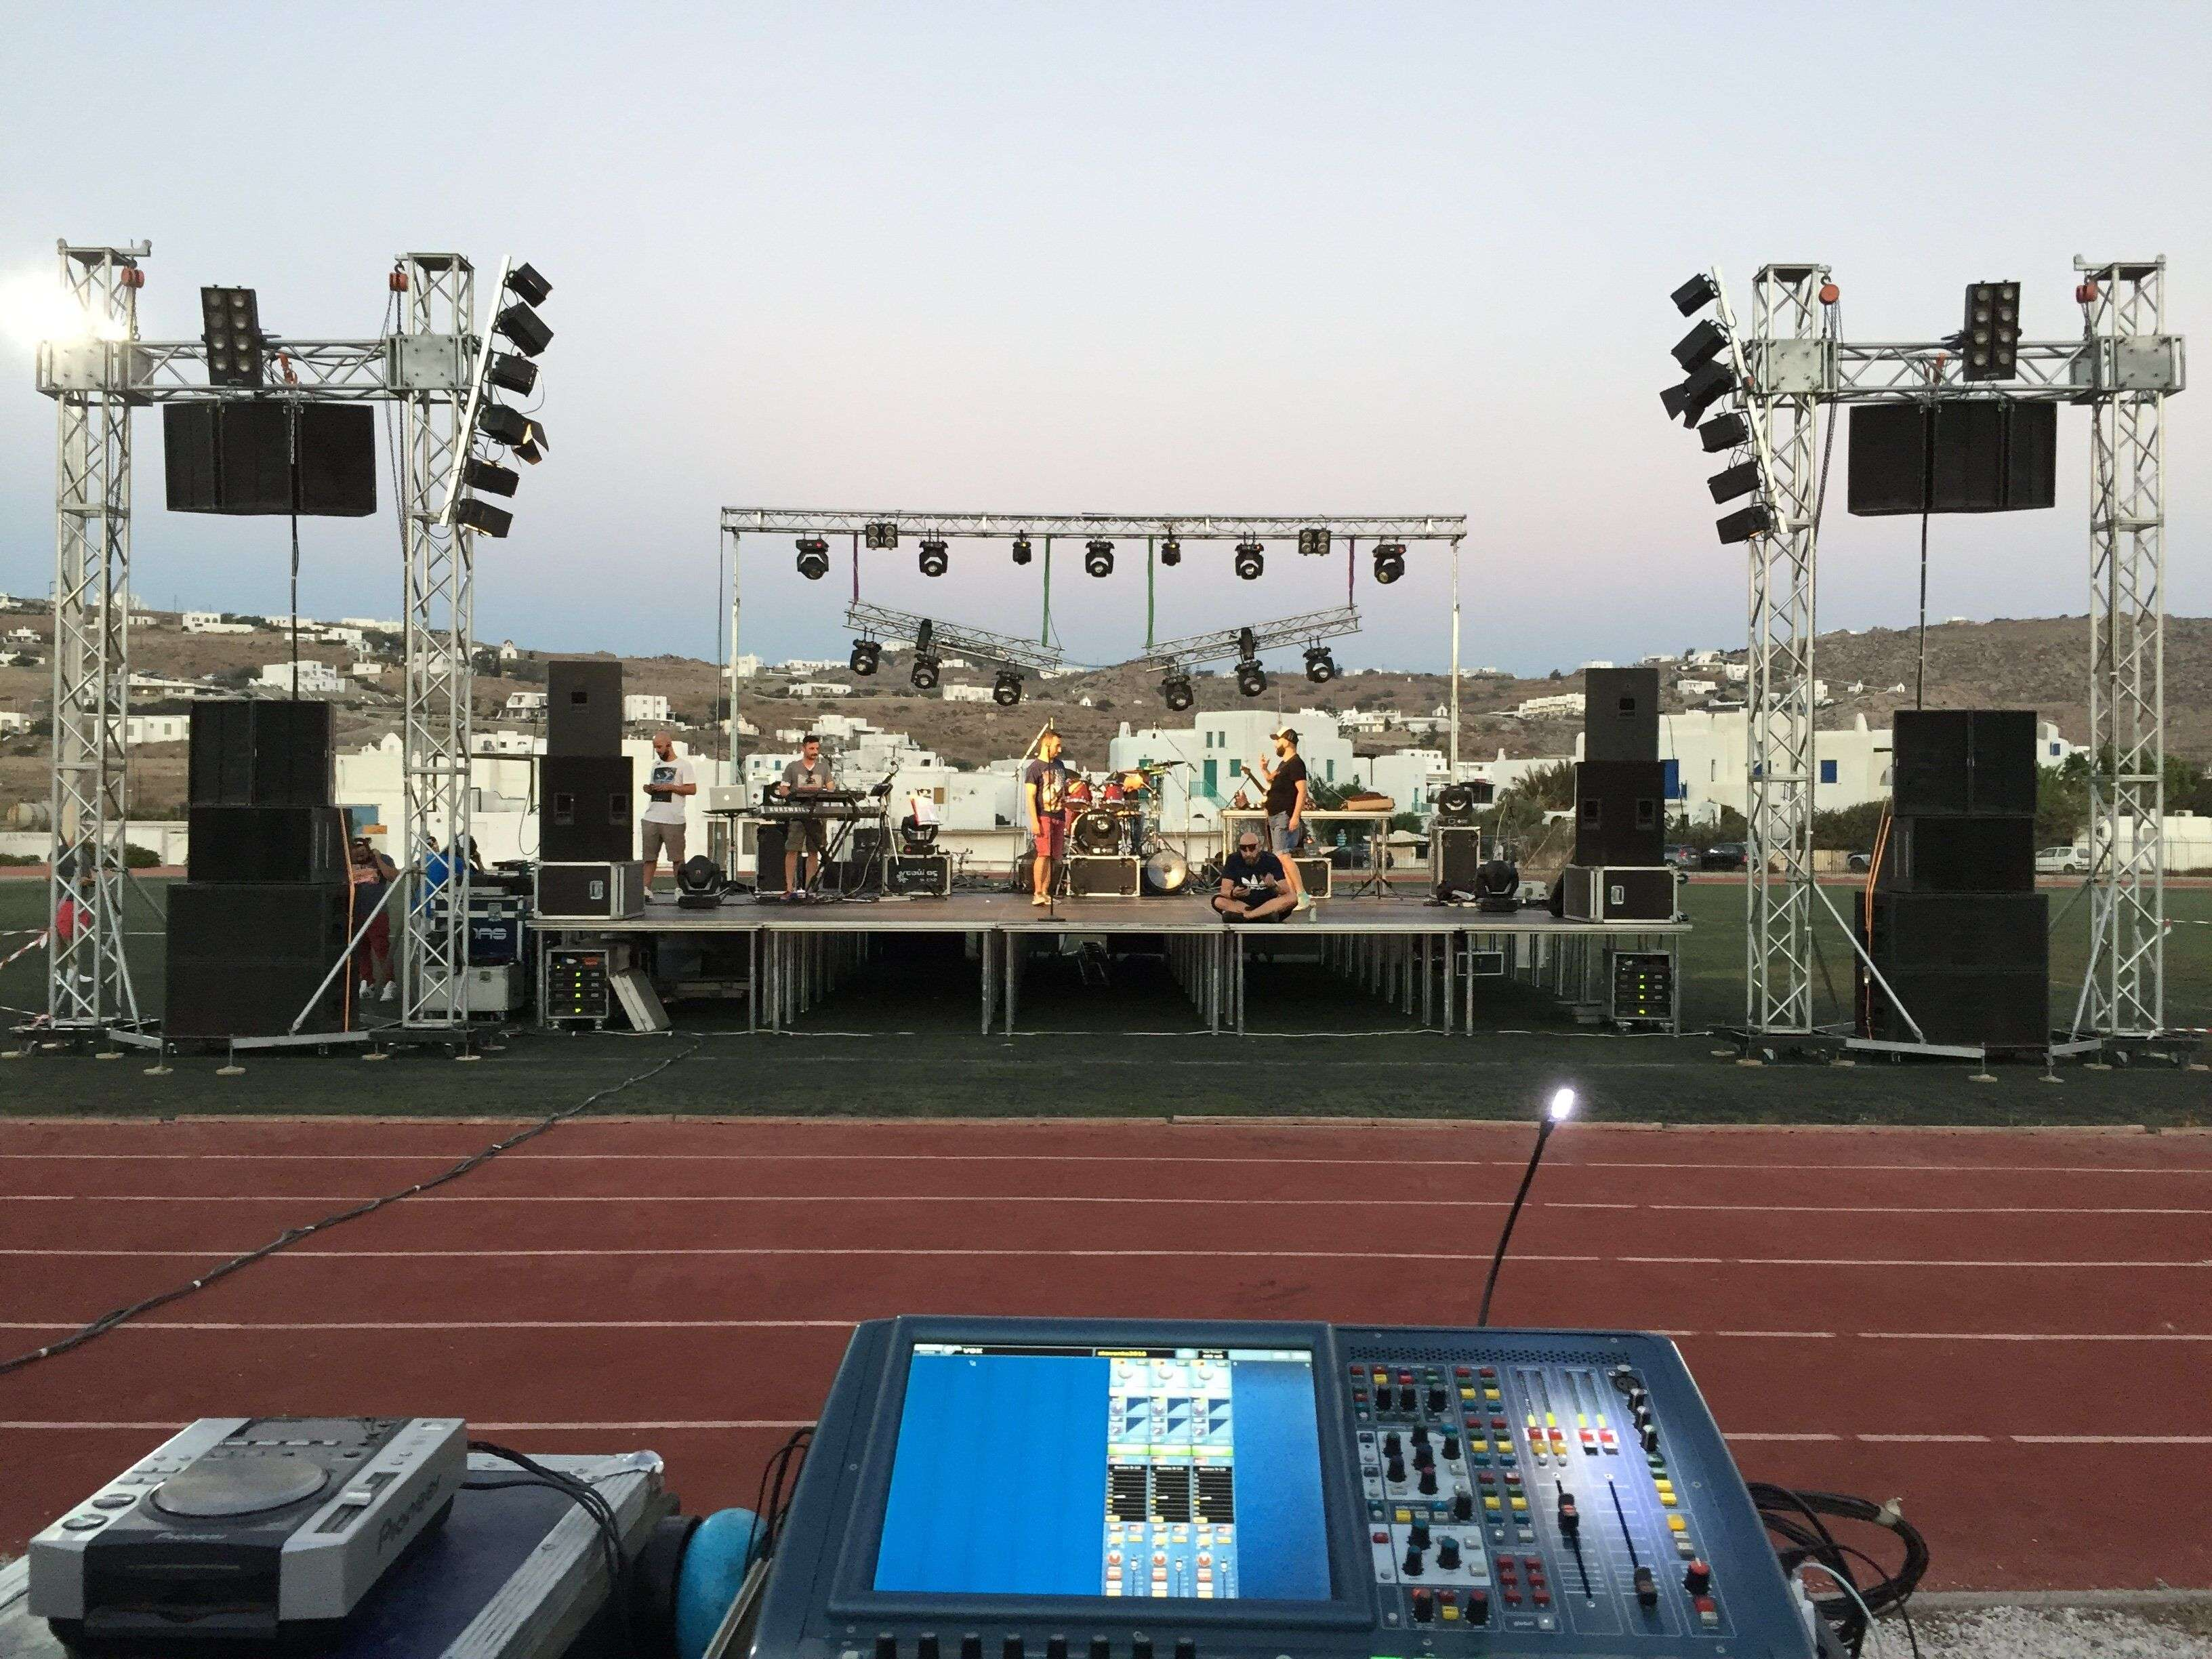 STAVENTO Live Concert-Mykonos 2016